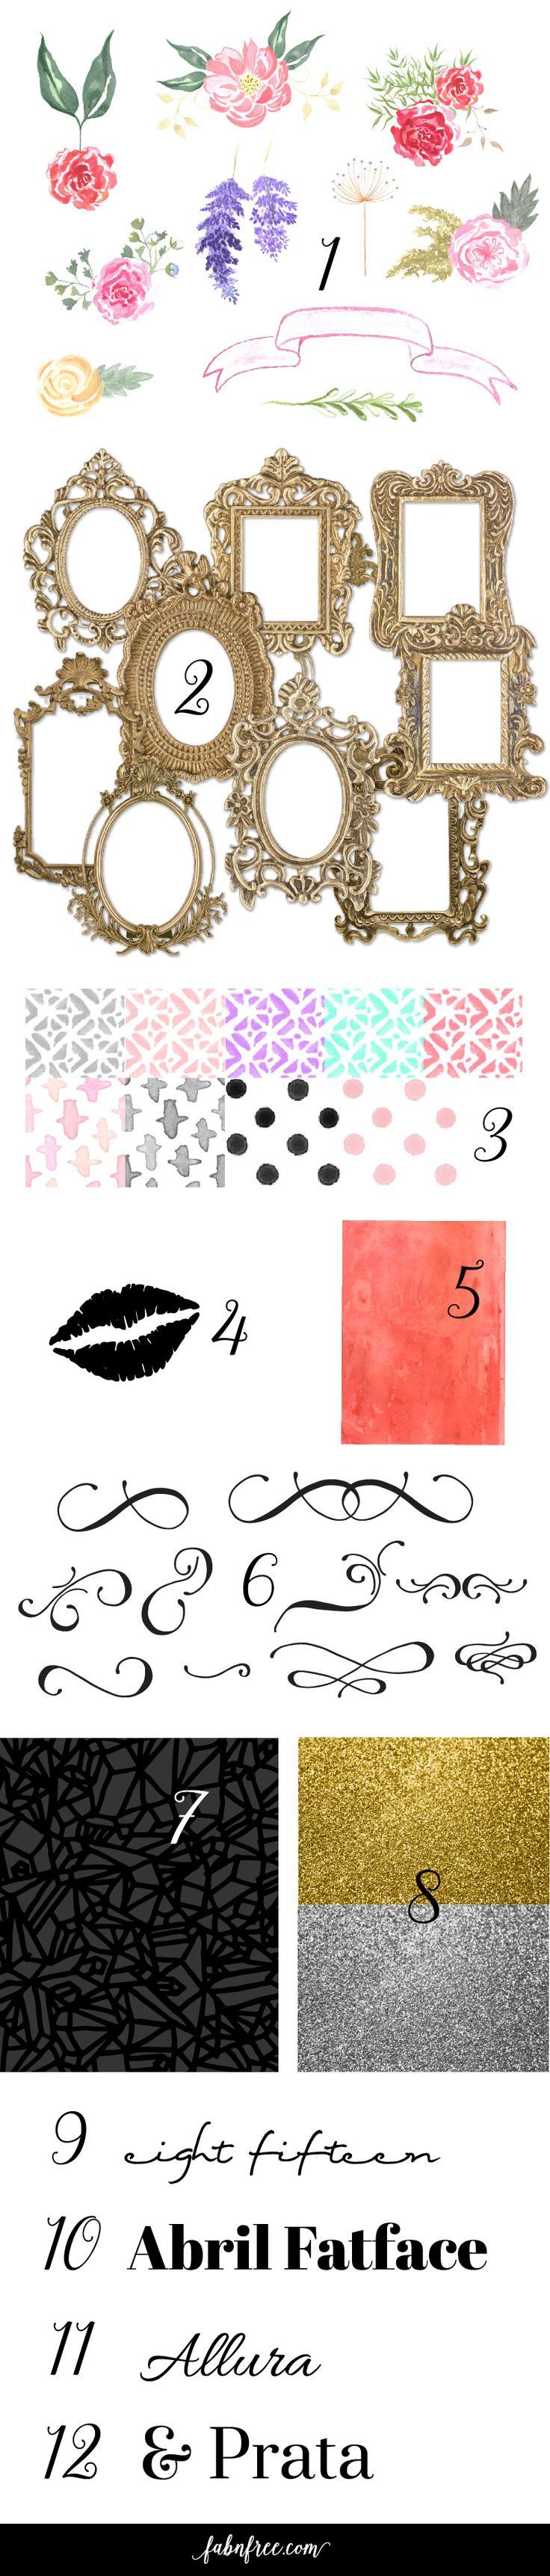 17 Best ideas about Clip Art Free on Pinterest | Clip art, Heart ...